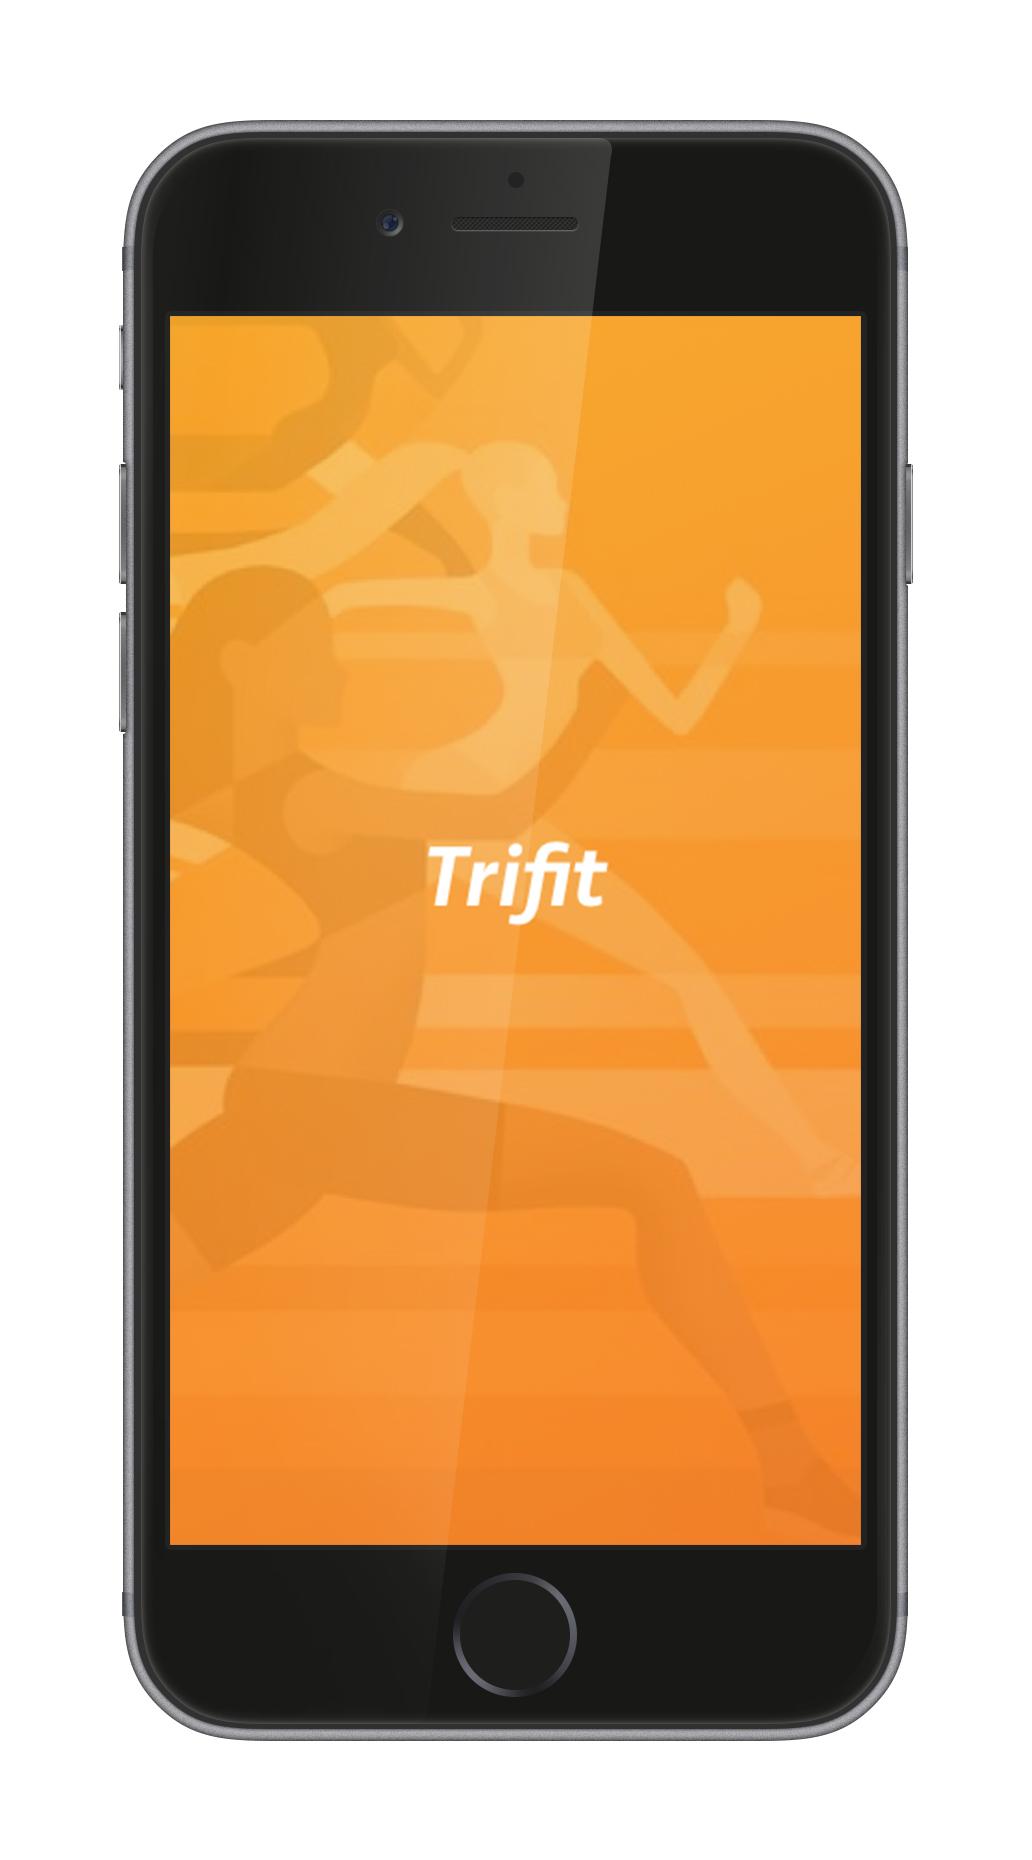 Trifit App Load Screen